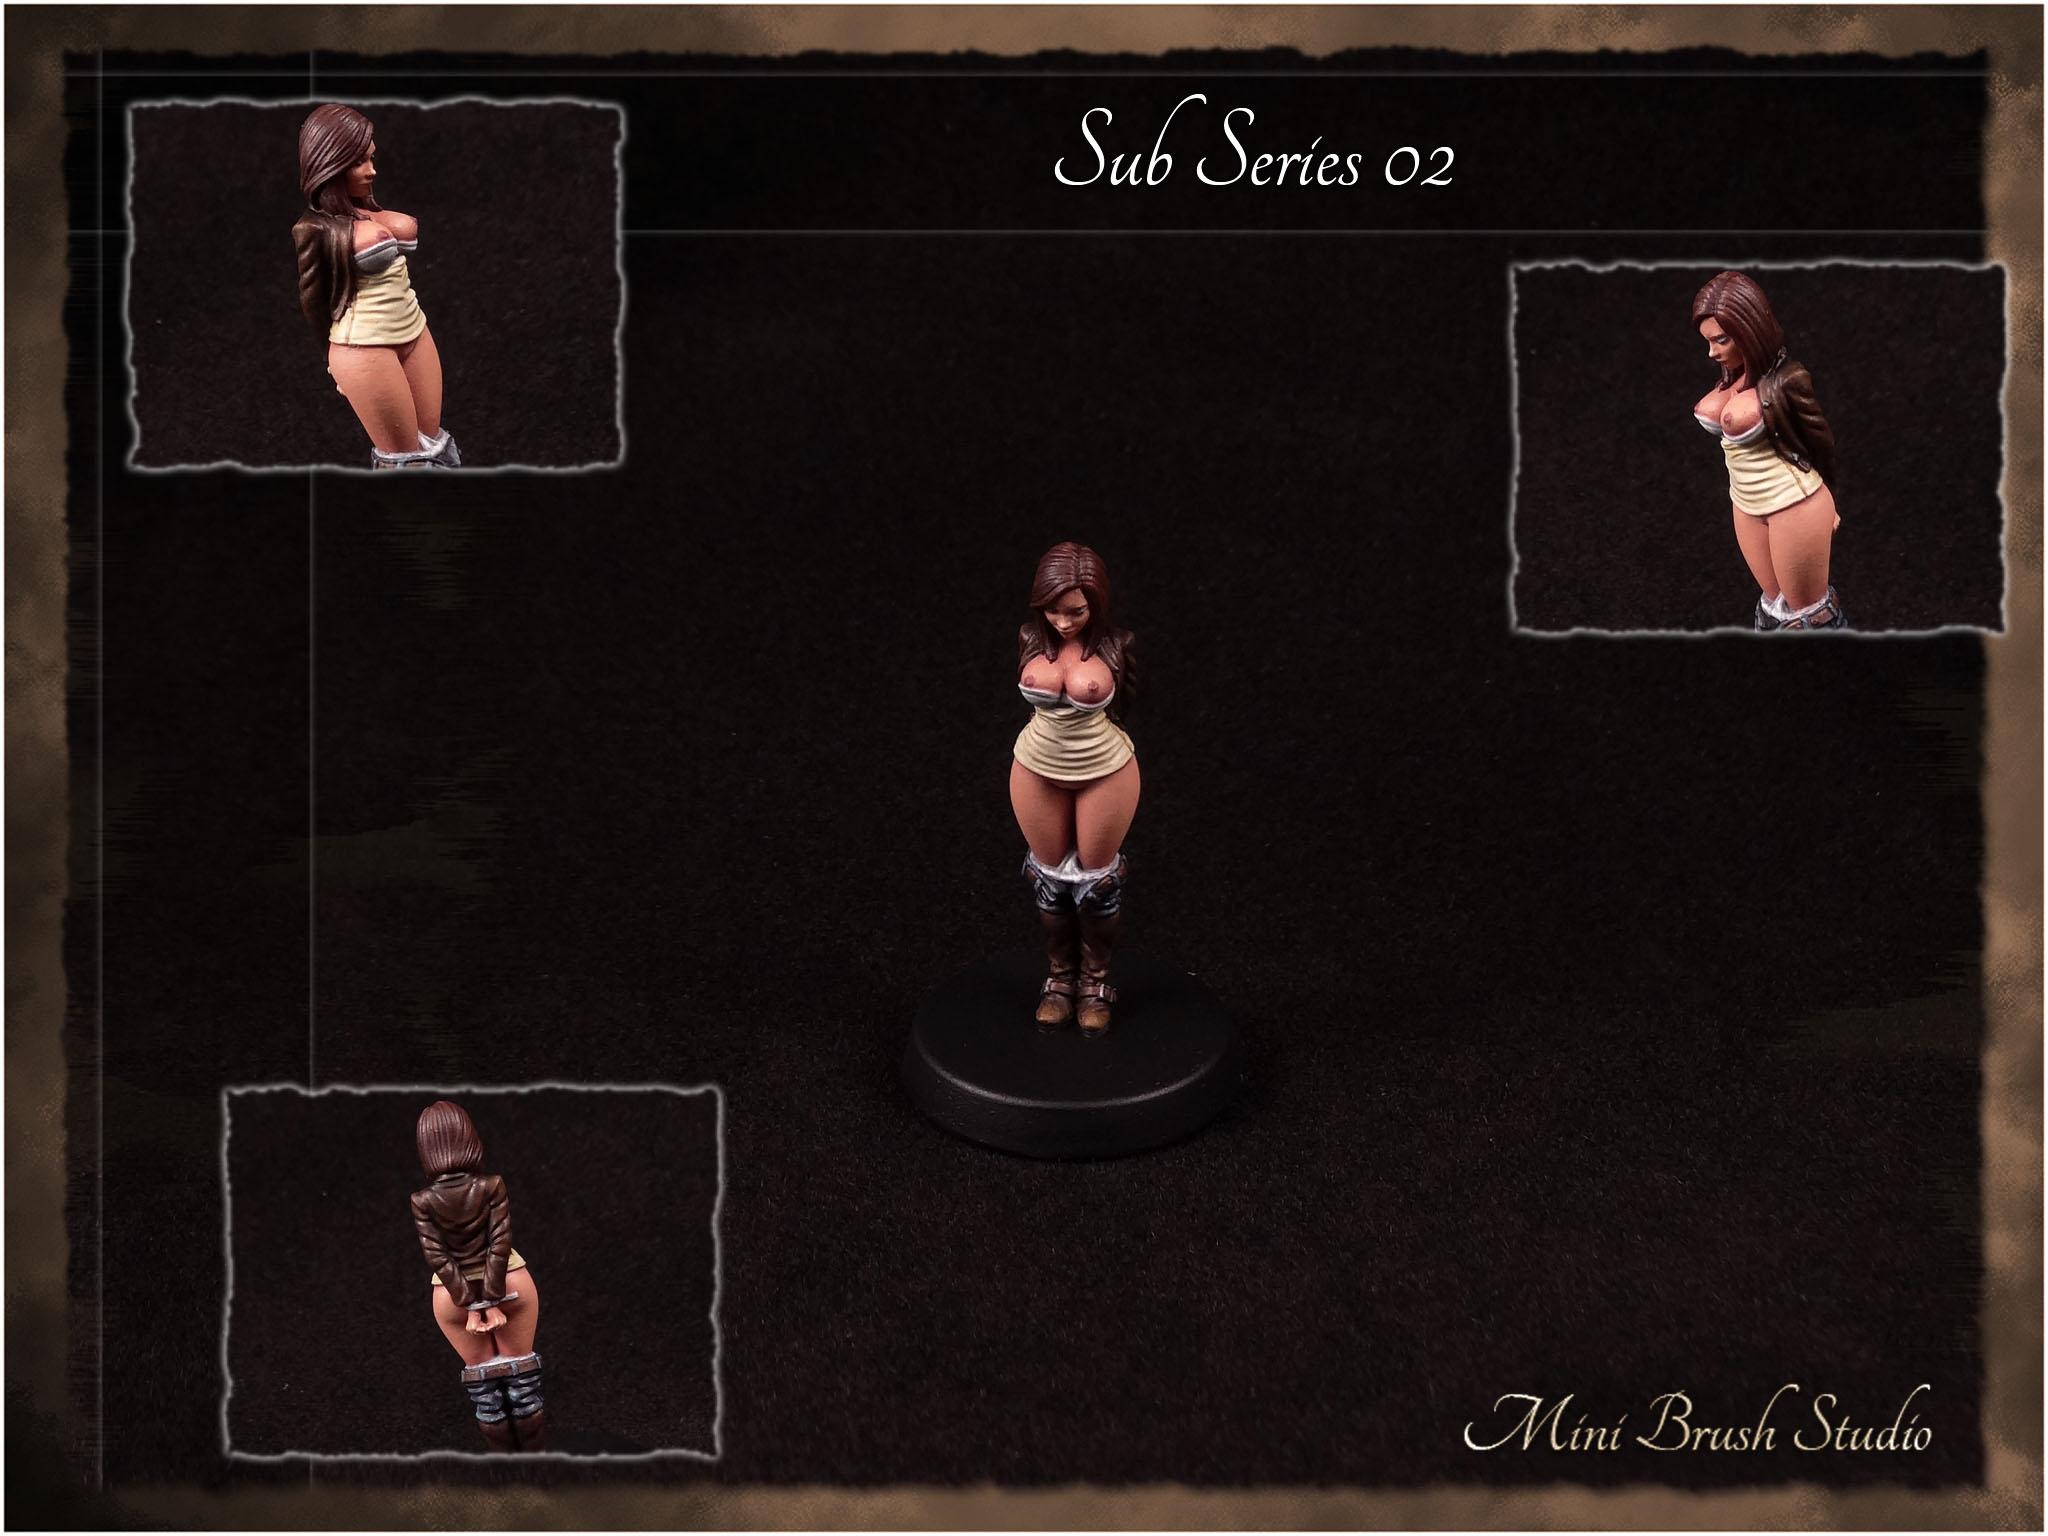 Sub Series 02 - Manufaktura Miniatures 1 v7.00.jpg